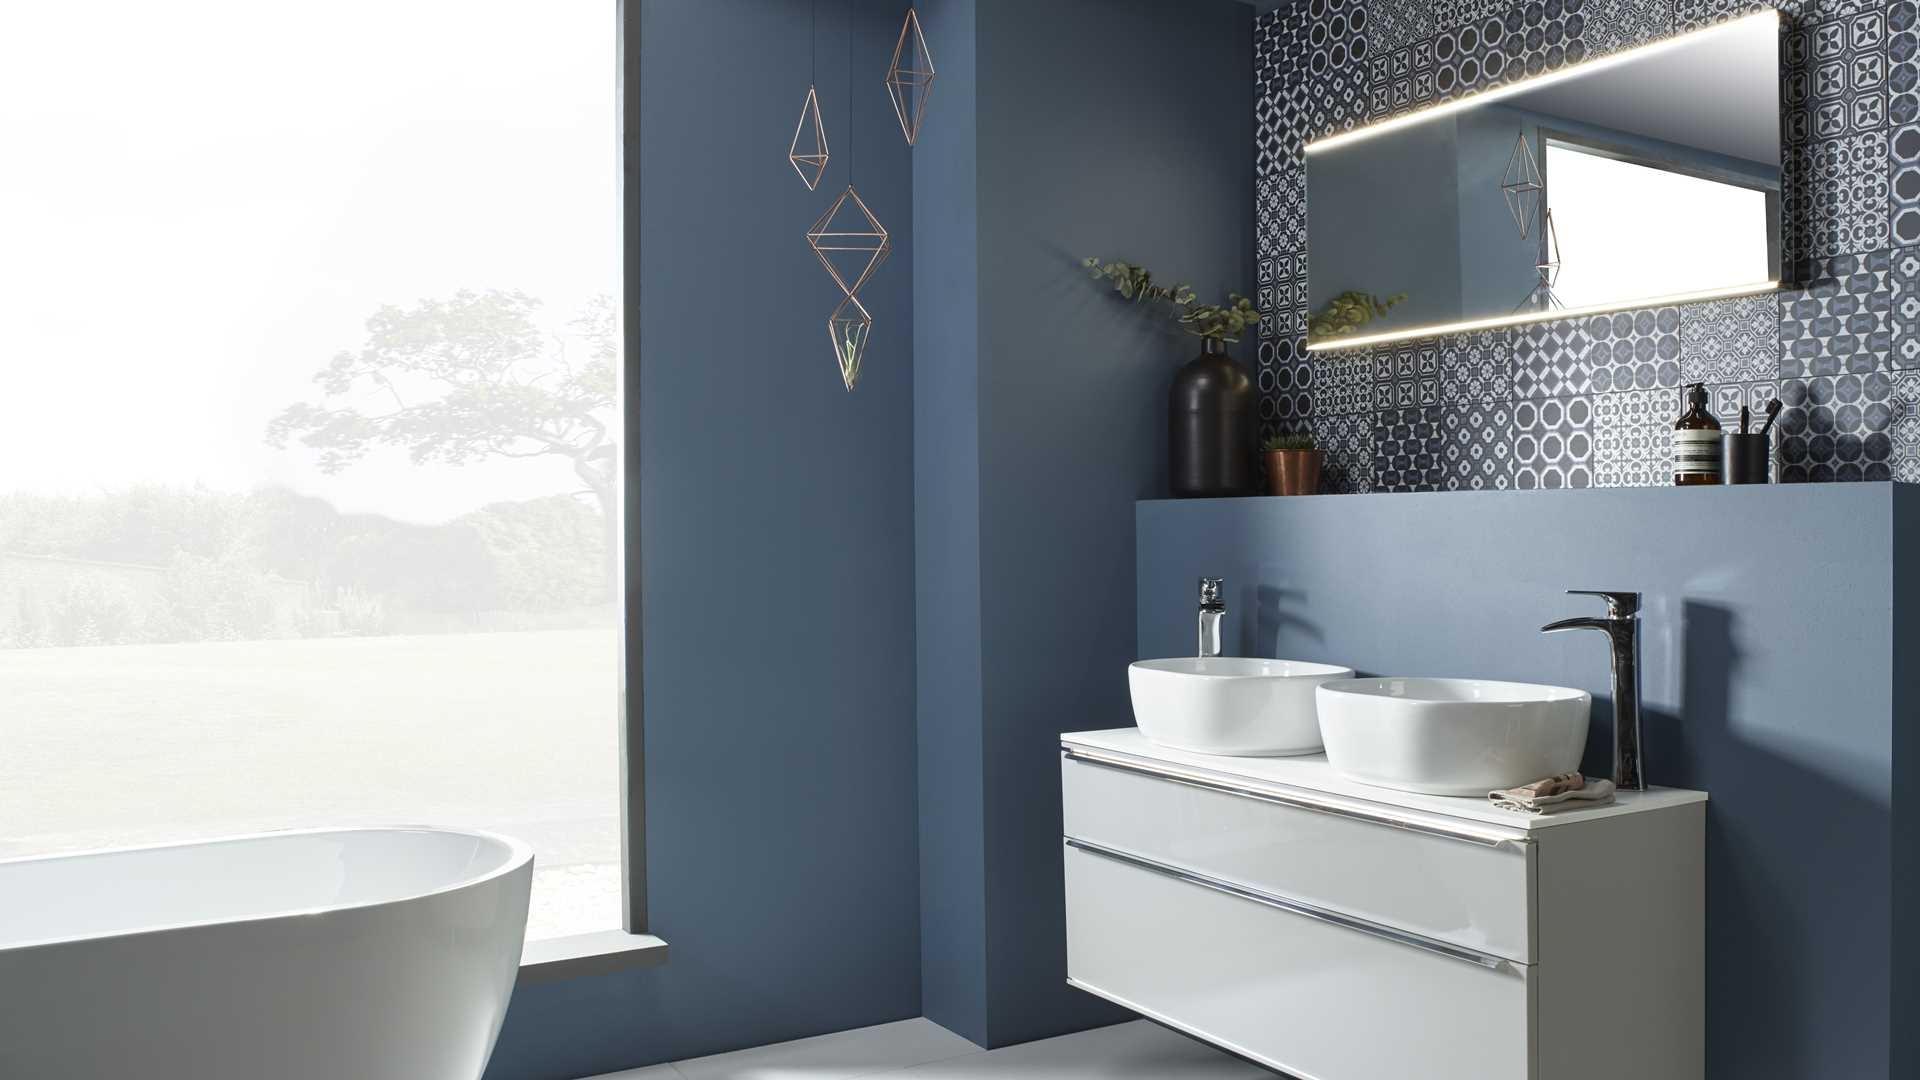 Bathroom  (@bathroomromford) Cover Image